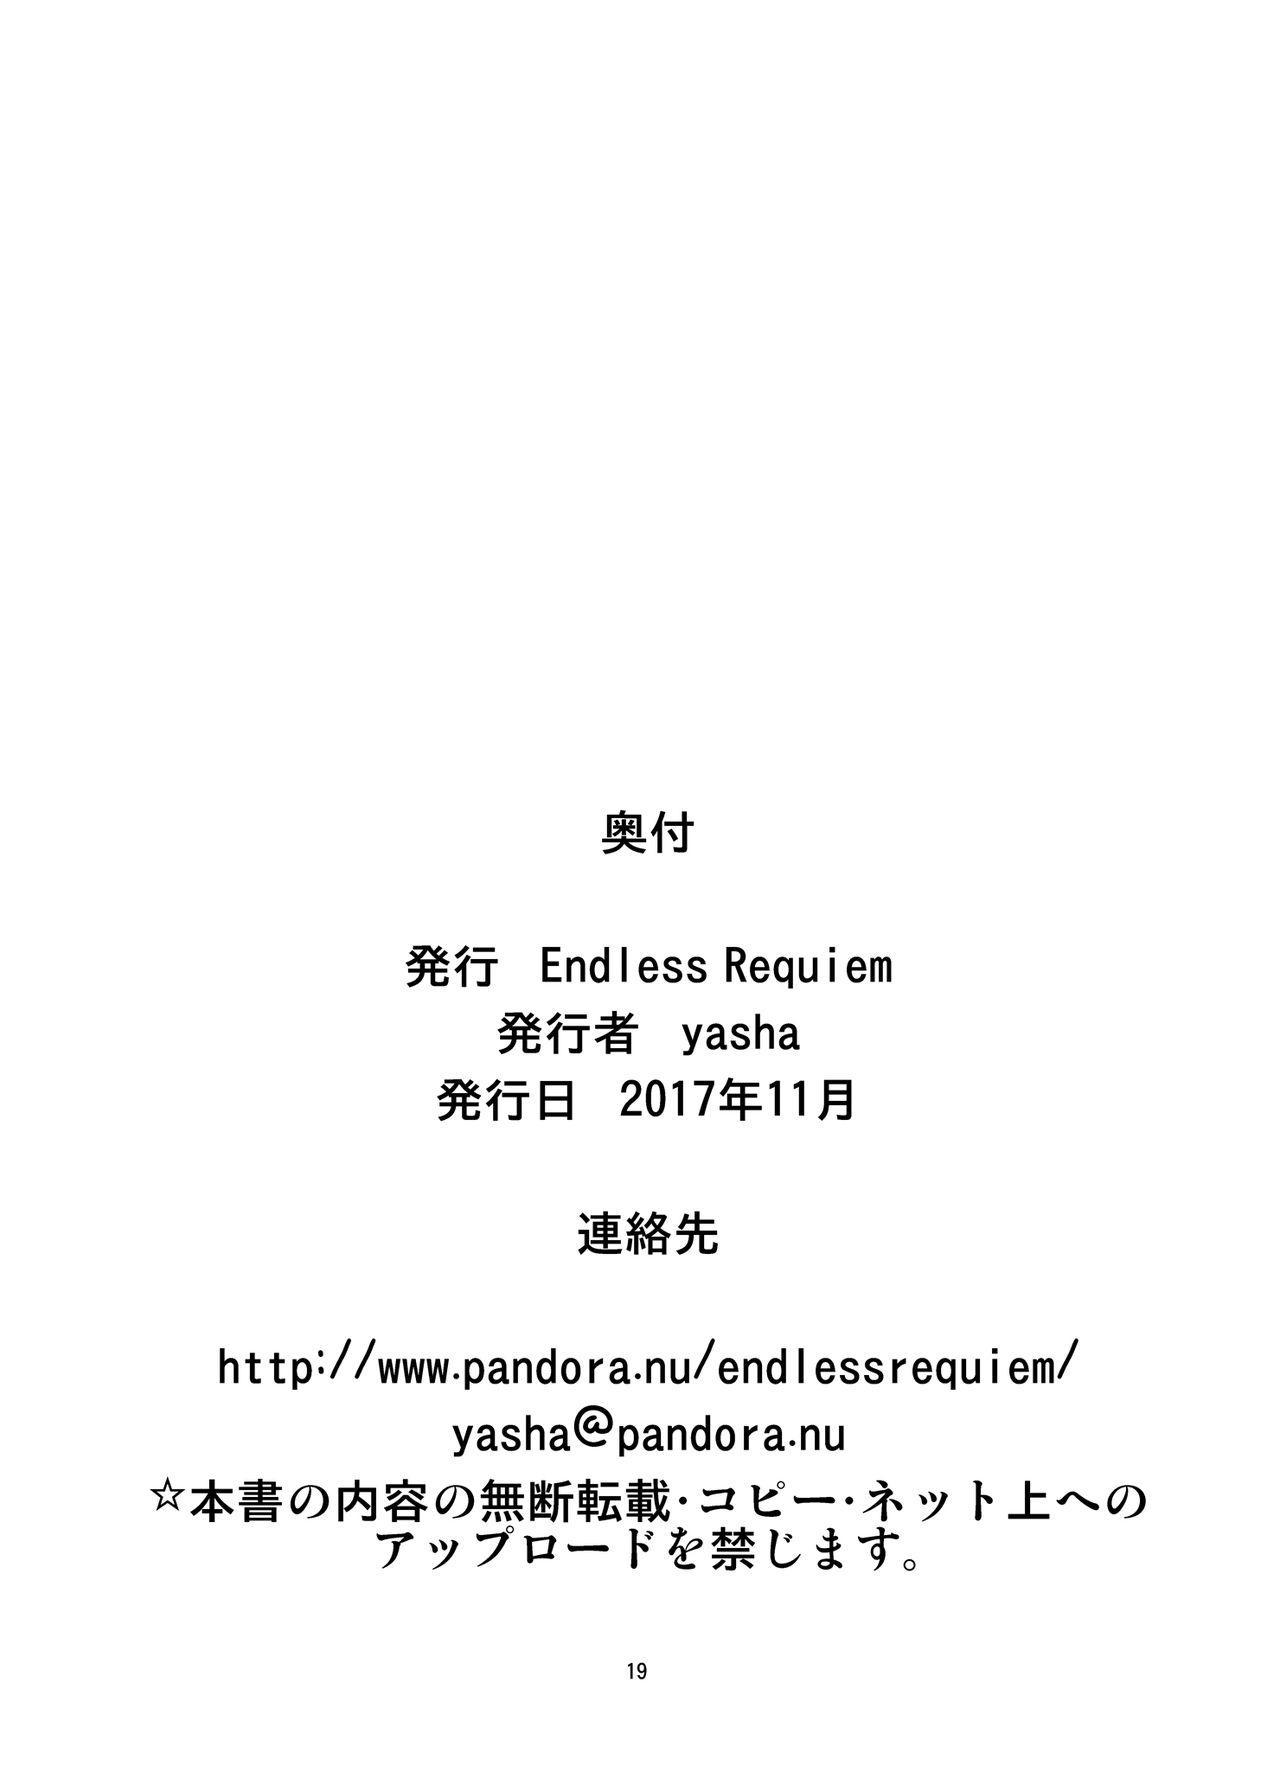 Boukensha Senyou no Ura Fuuzokuten    A Backdoor Brothel for Adventurers 18